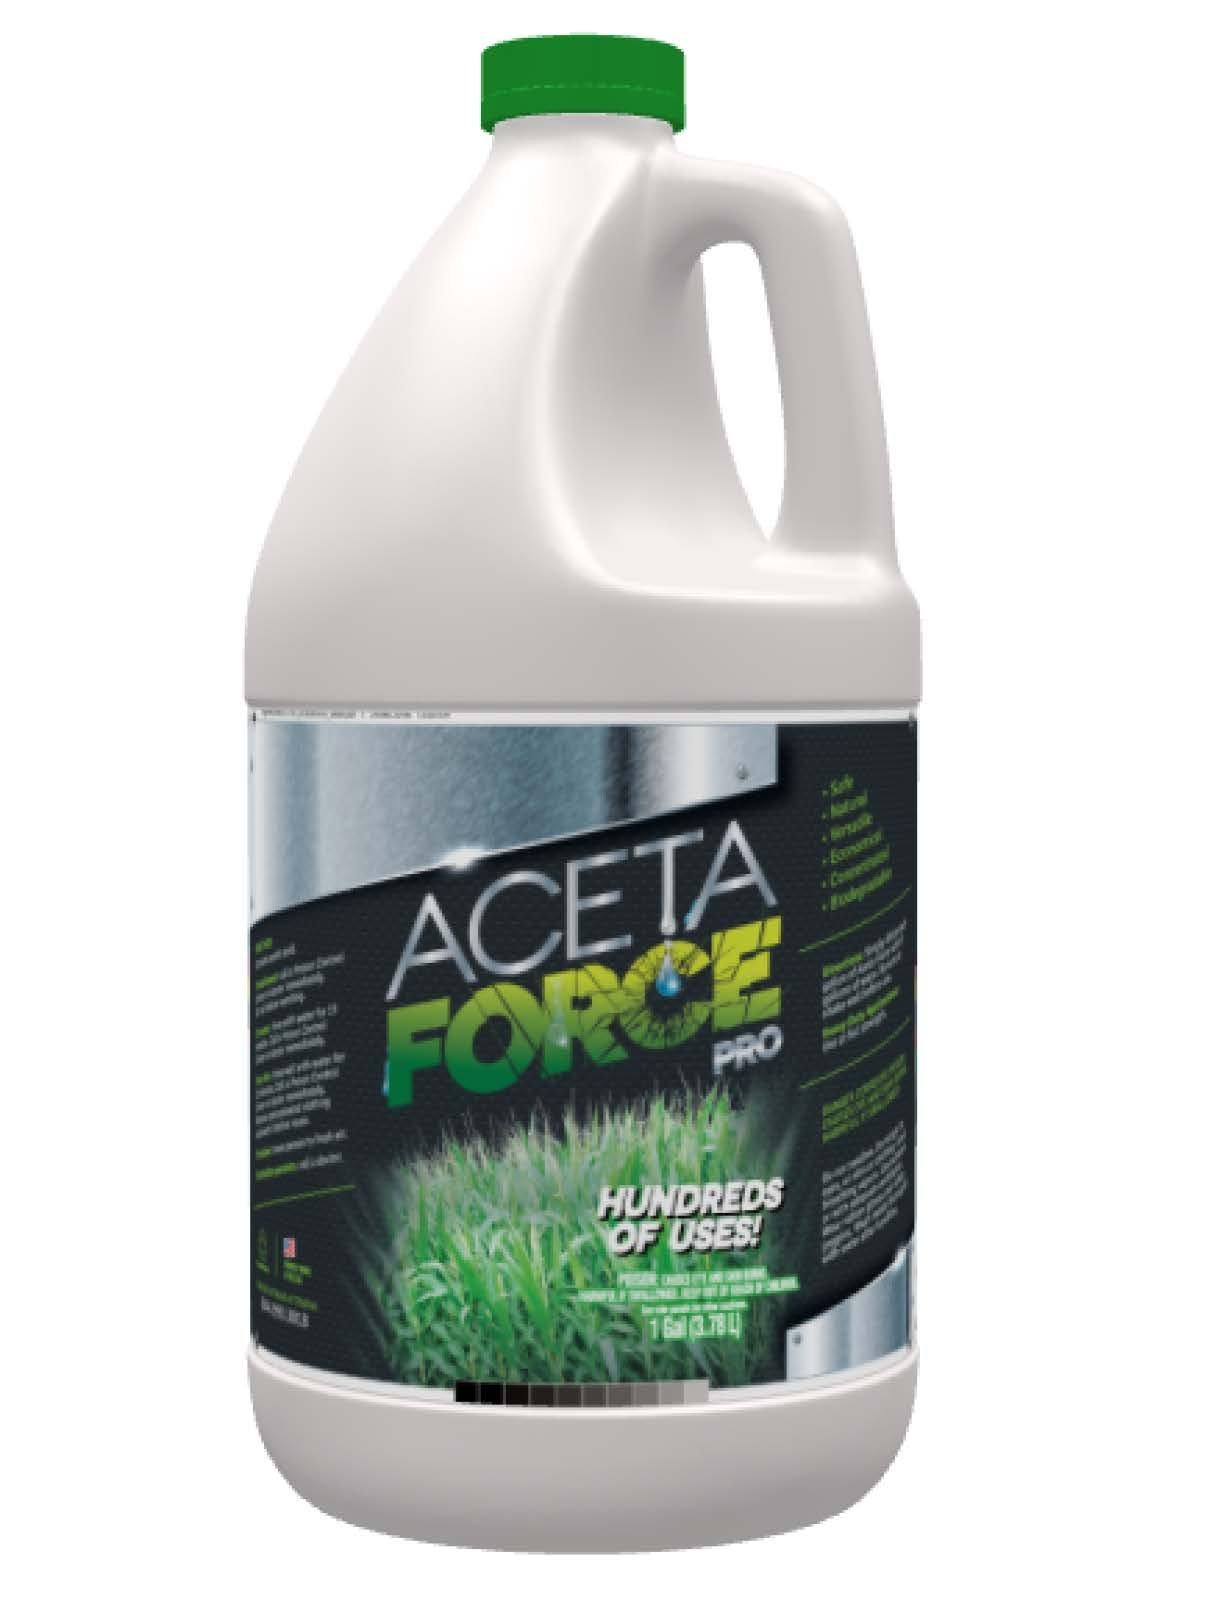 ACETA FORCE Industrial Strength 30% Natural Acetic Acid VINEGAR Multi Purpose For Home & Garden - 1 Gallon (1 Gallon)